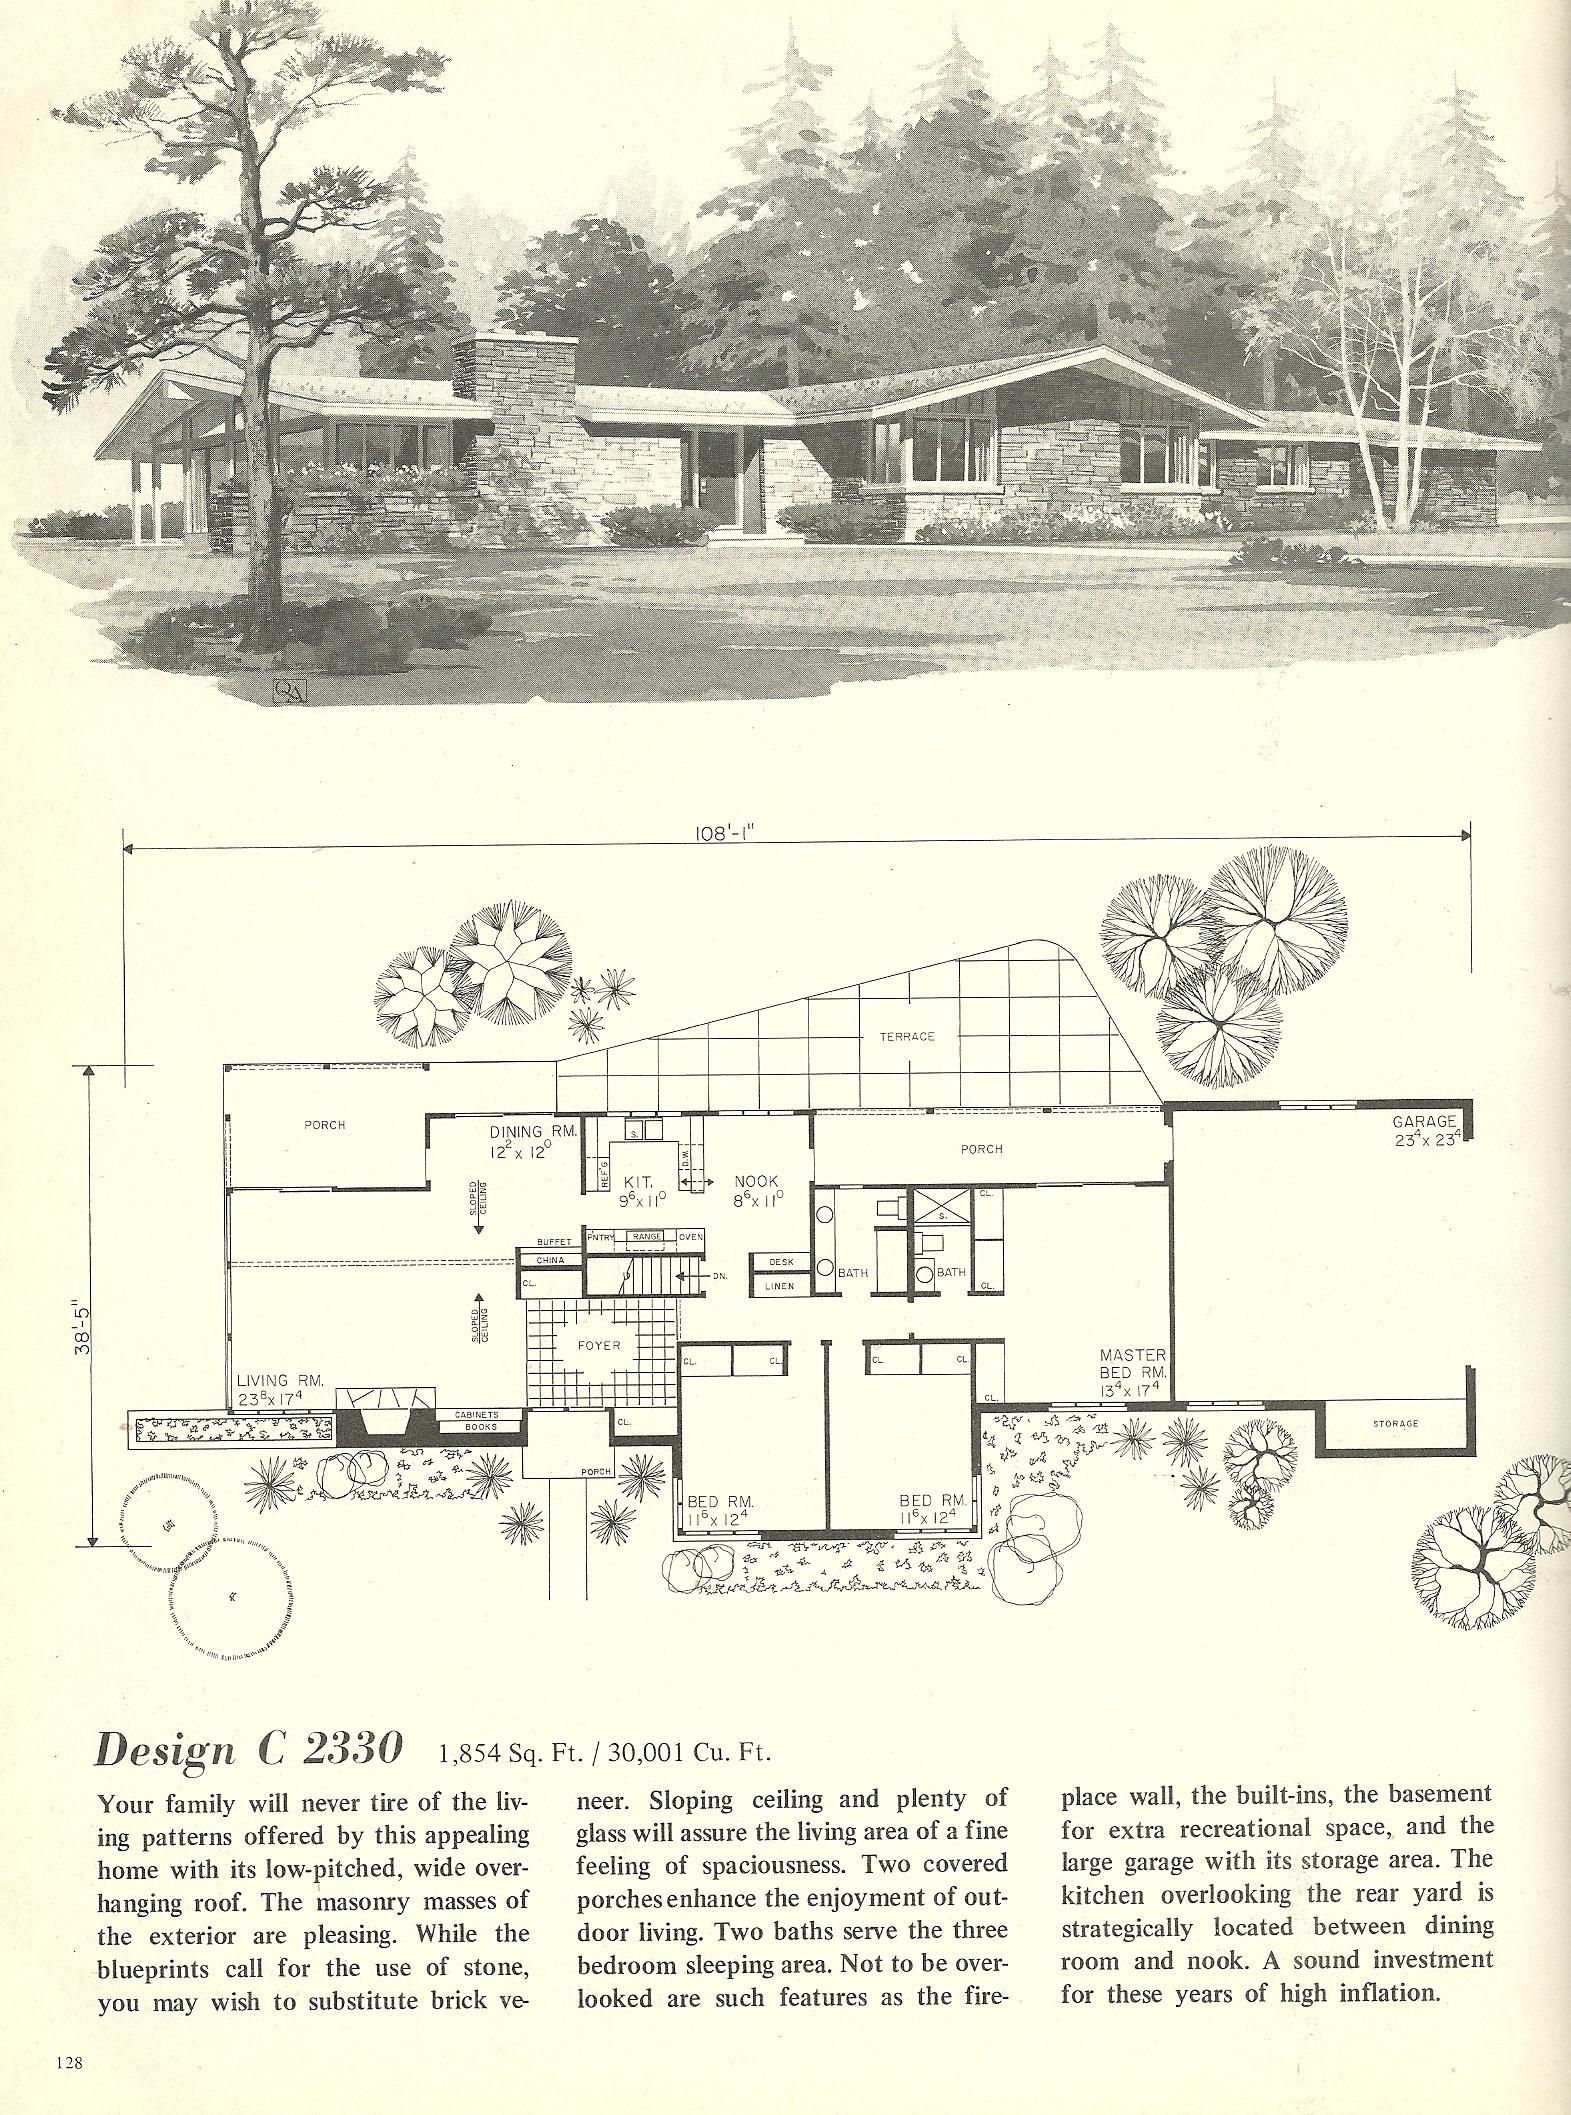 Vintage house plans 2330 antique alter ego for Retro house plans